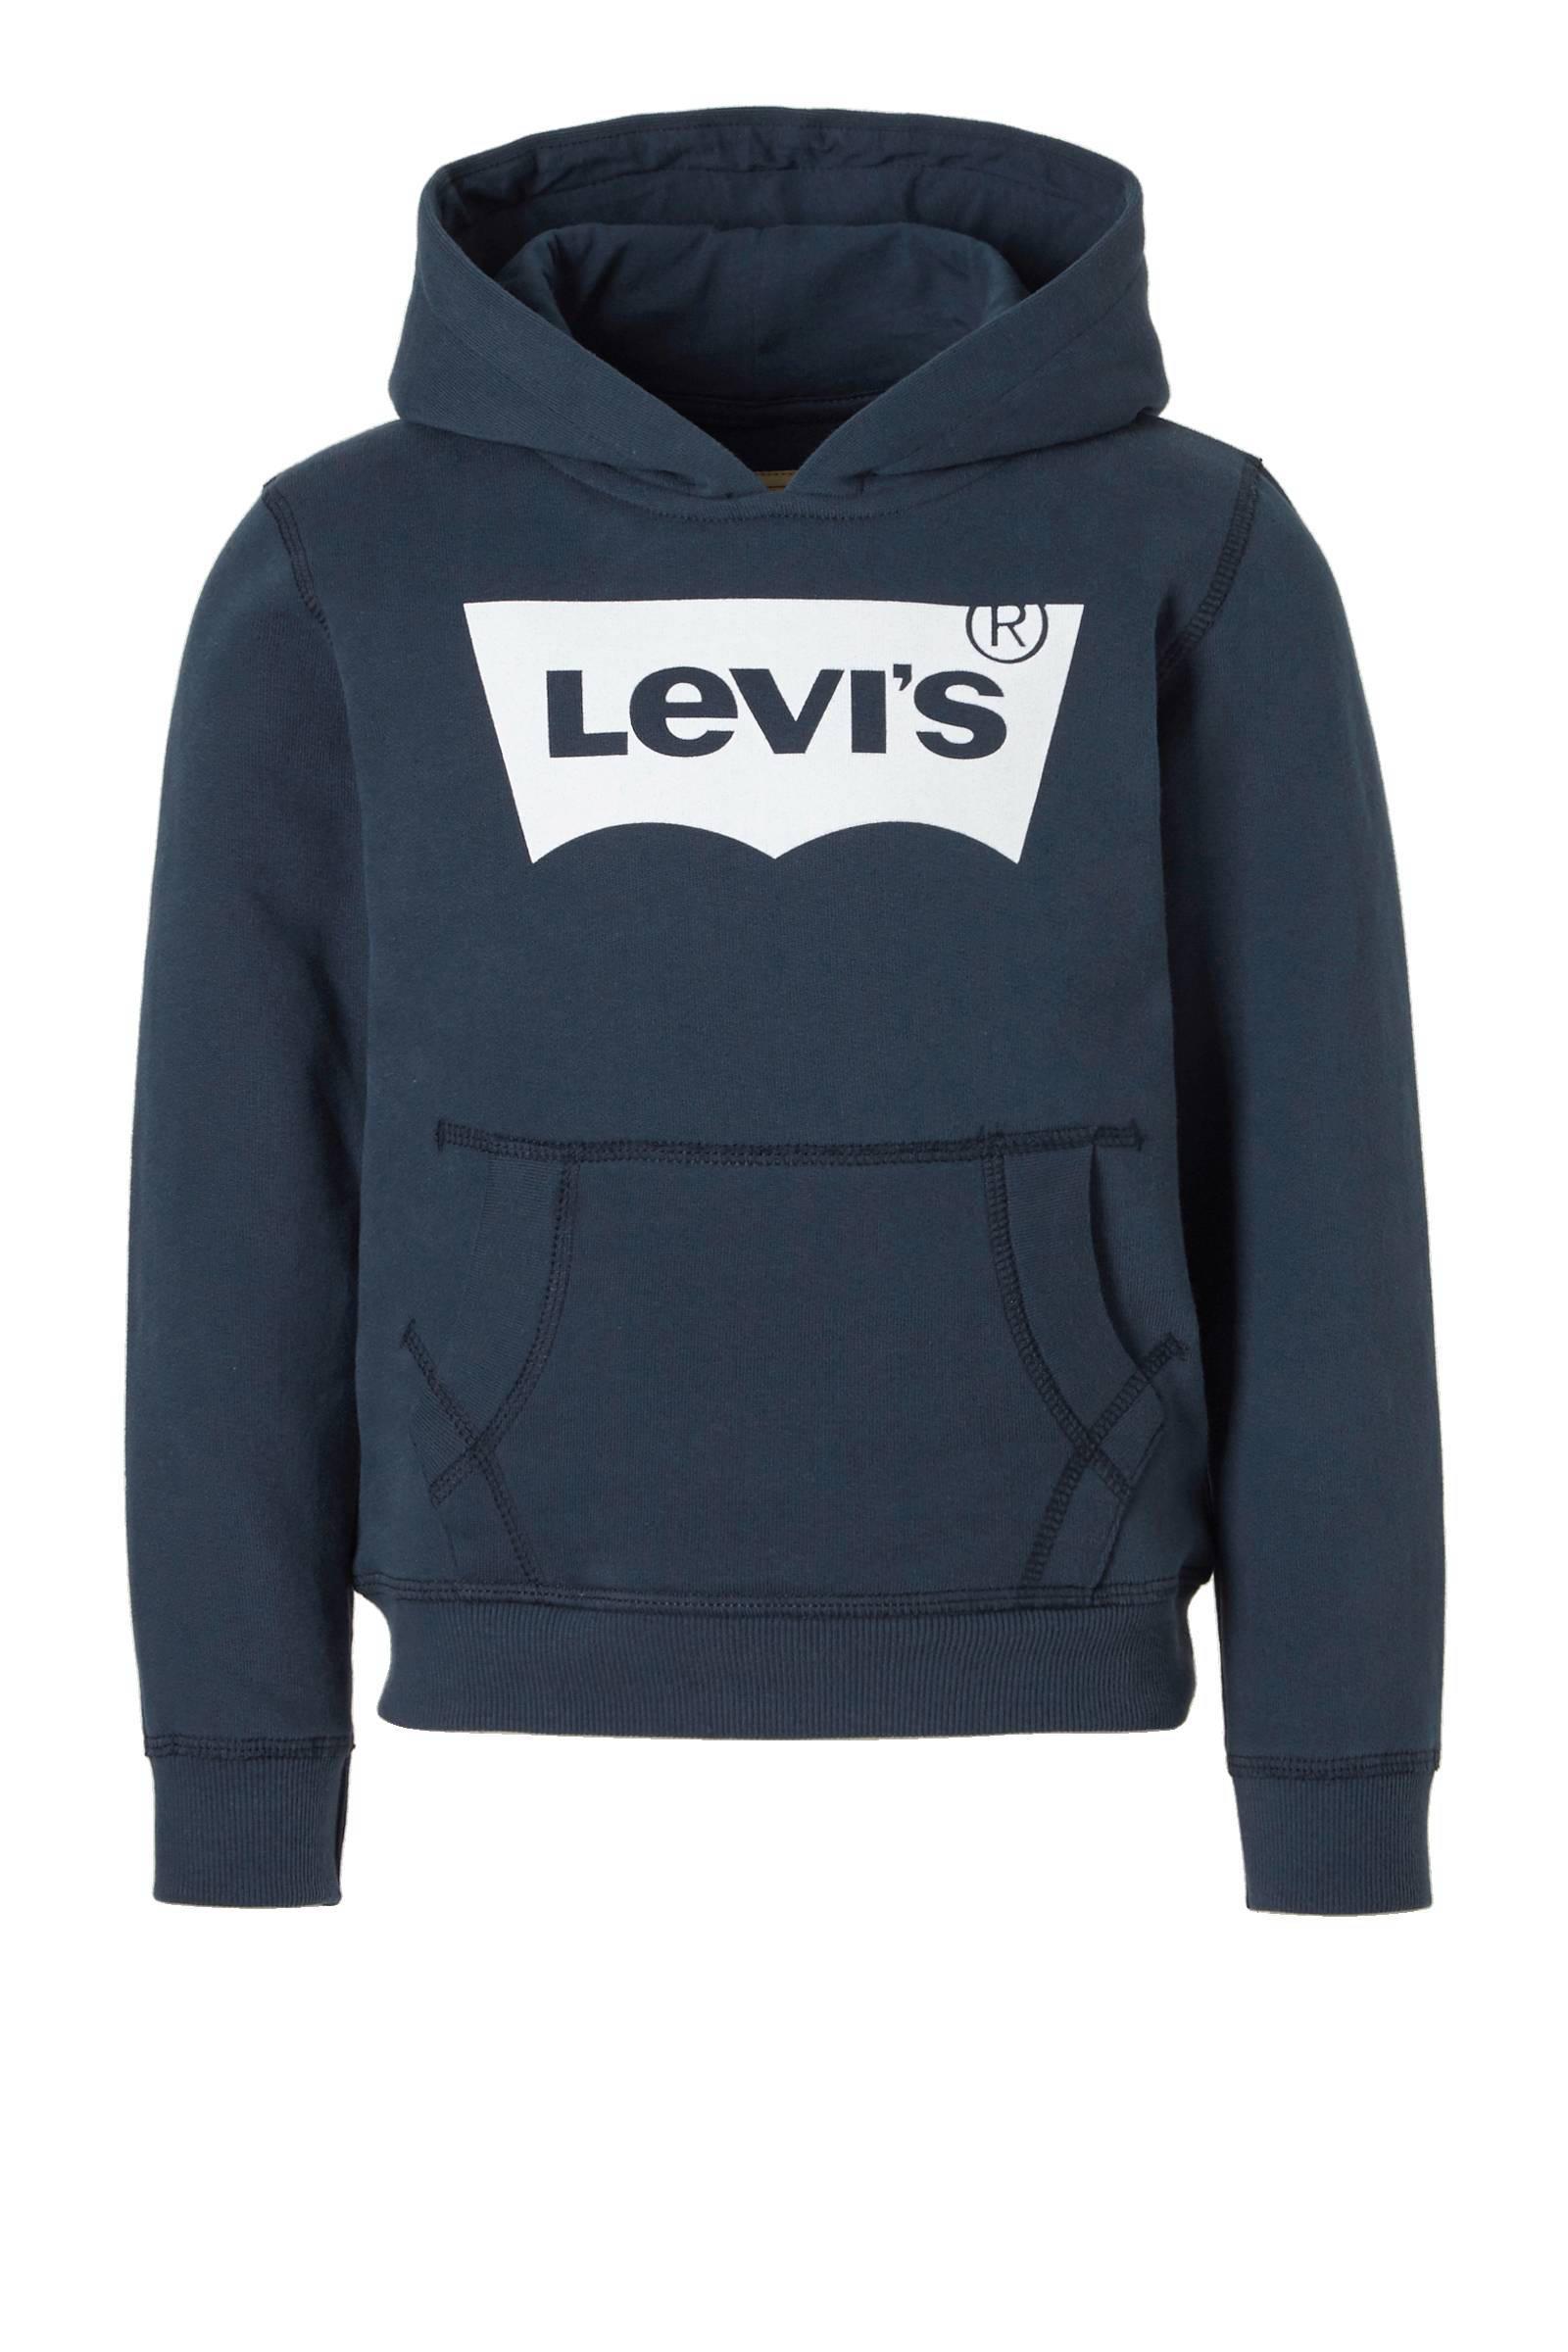 Levi's kids Levi's Kids hoodie met logoprint wit | wehkamp